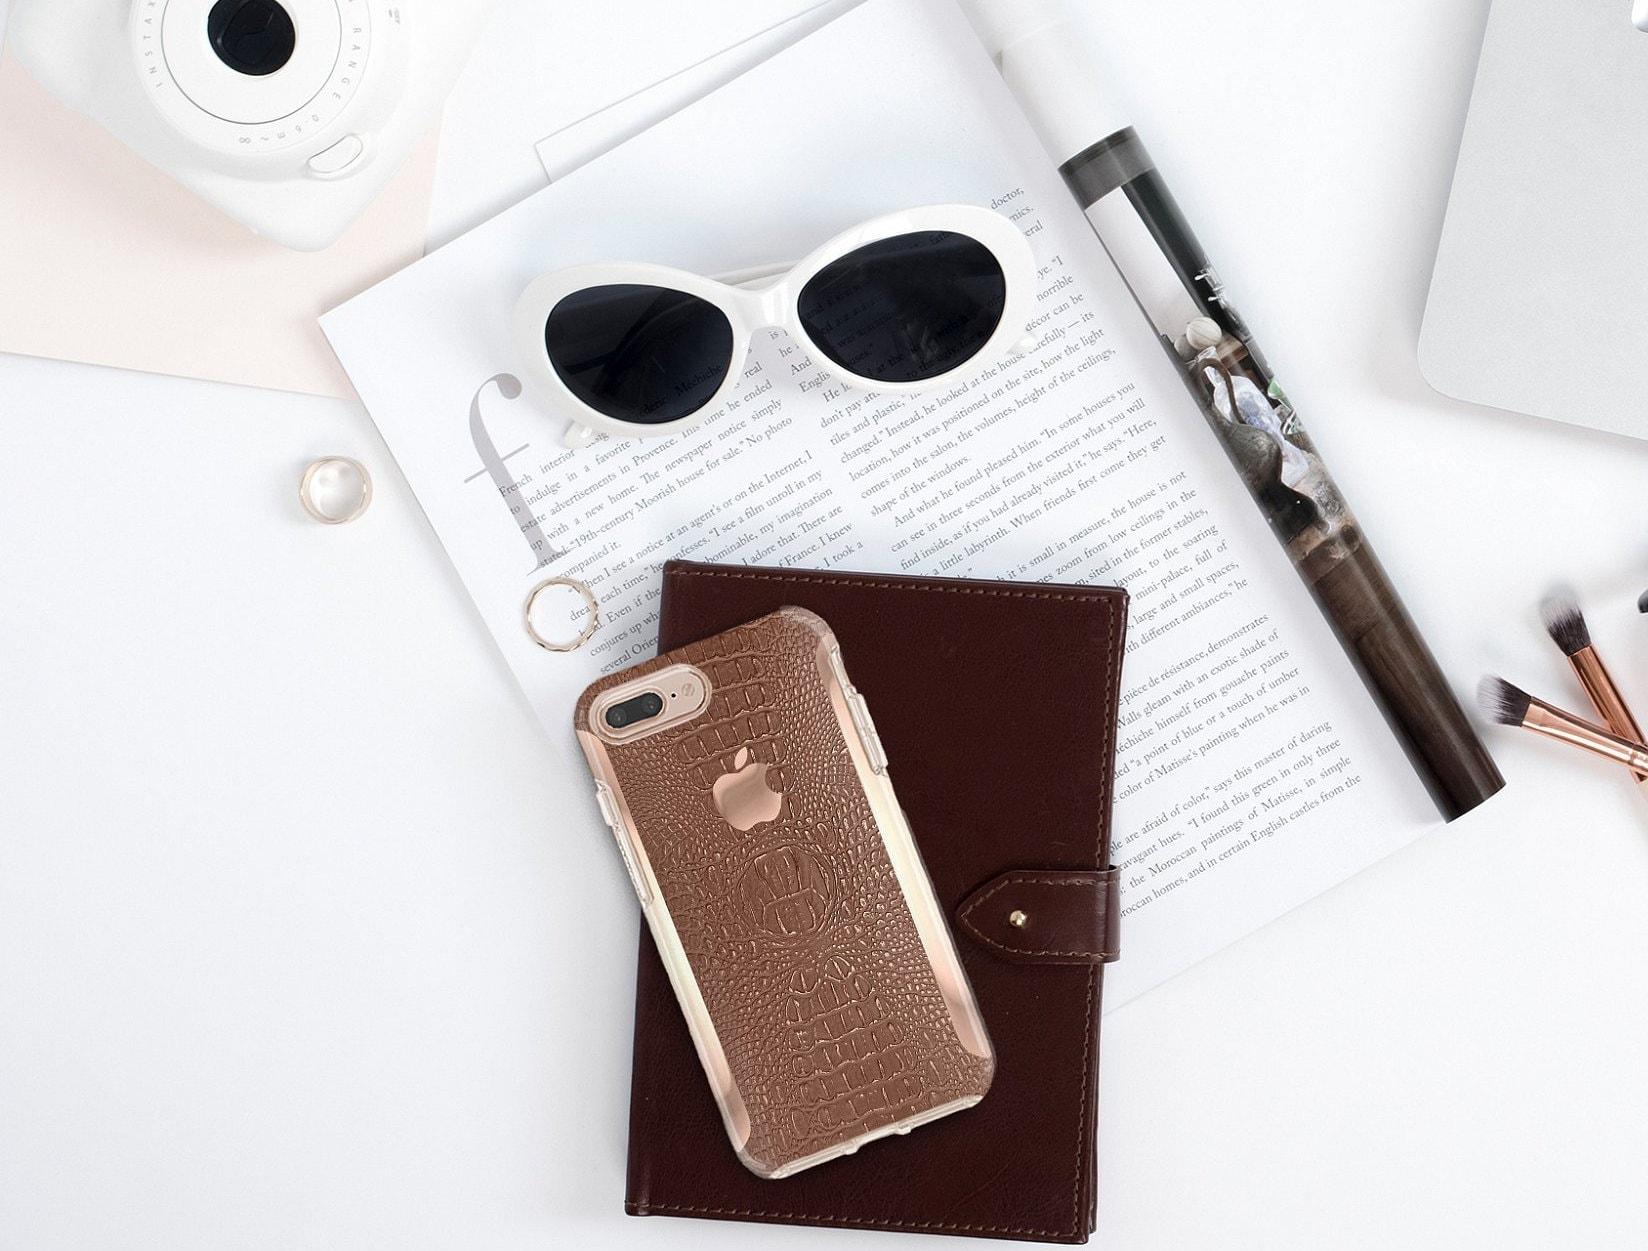 kate spade phone case iphone 8 plus nz